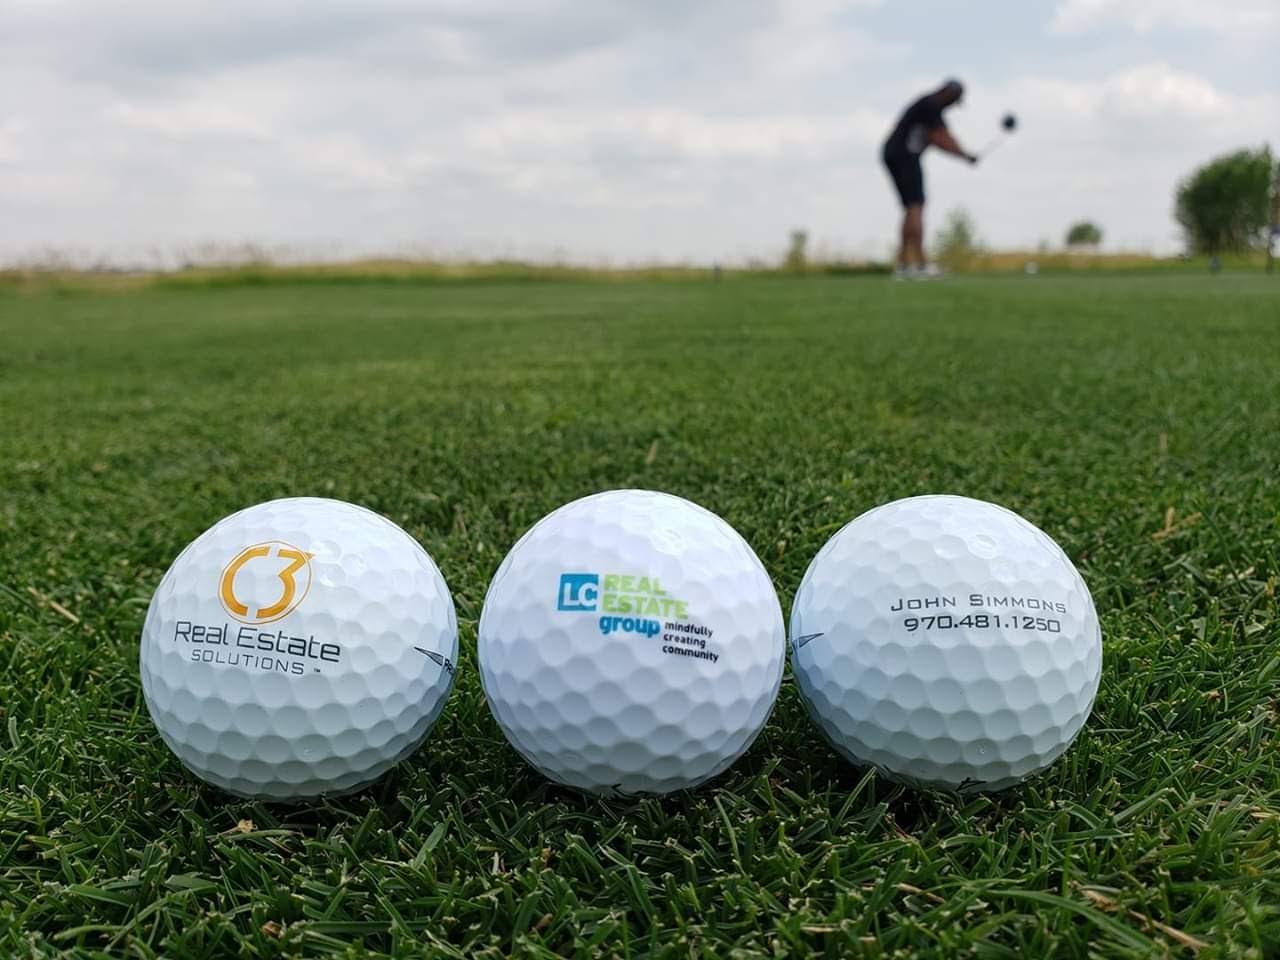 Lcreg-c3-golfballs